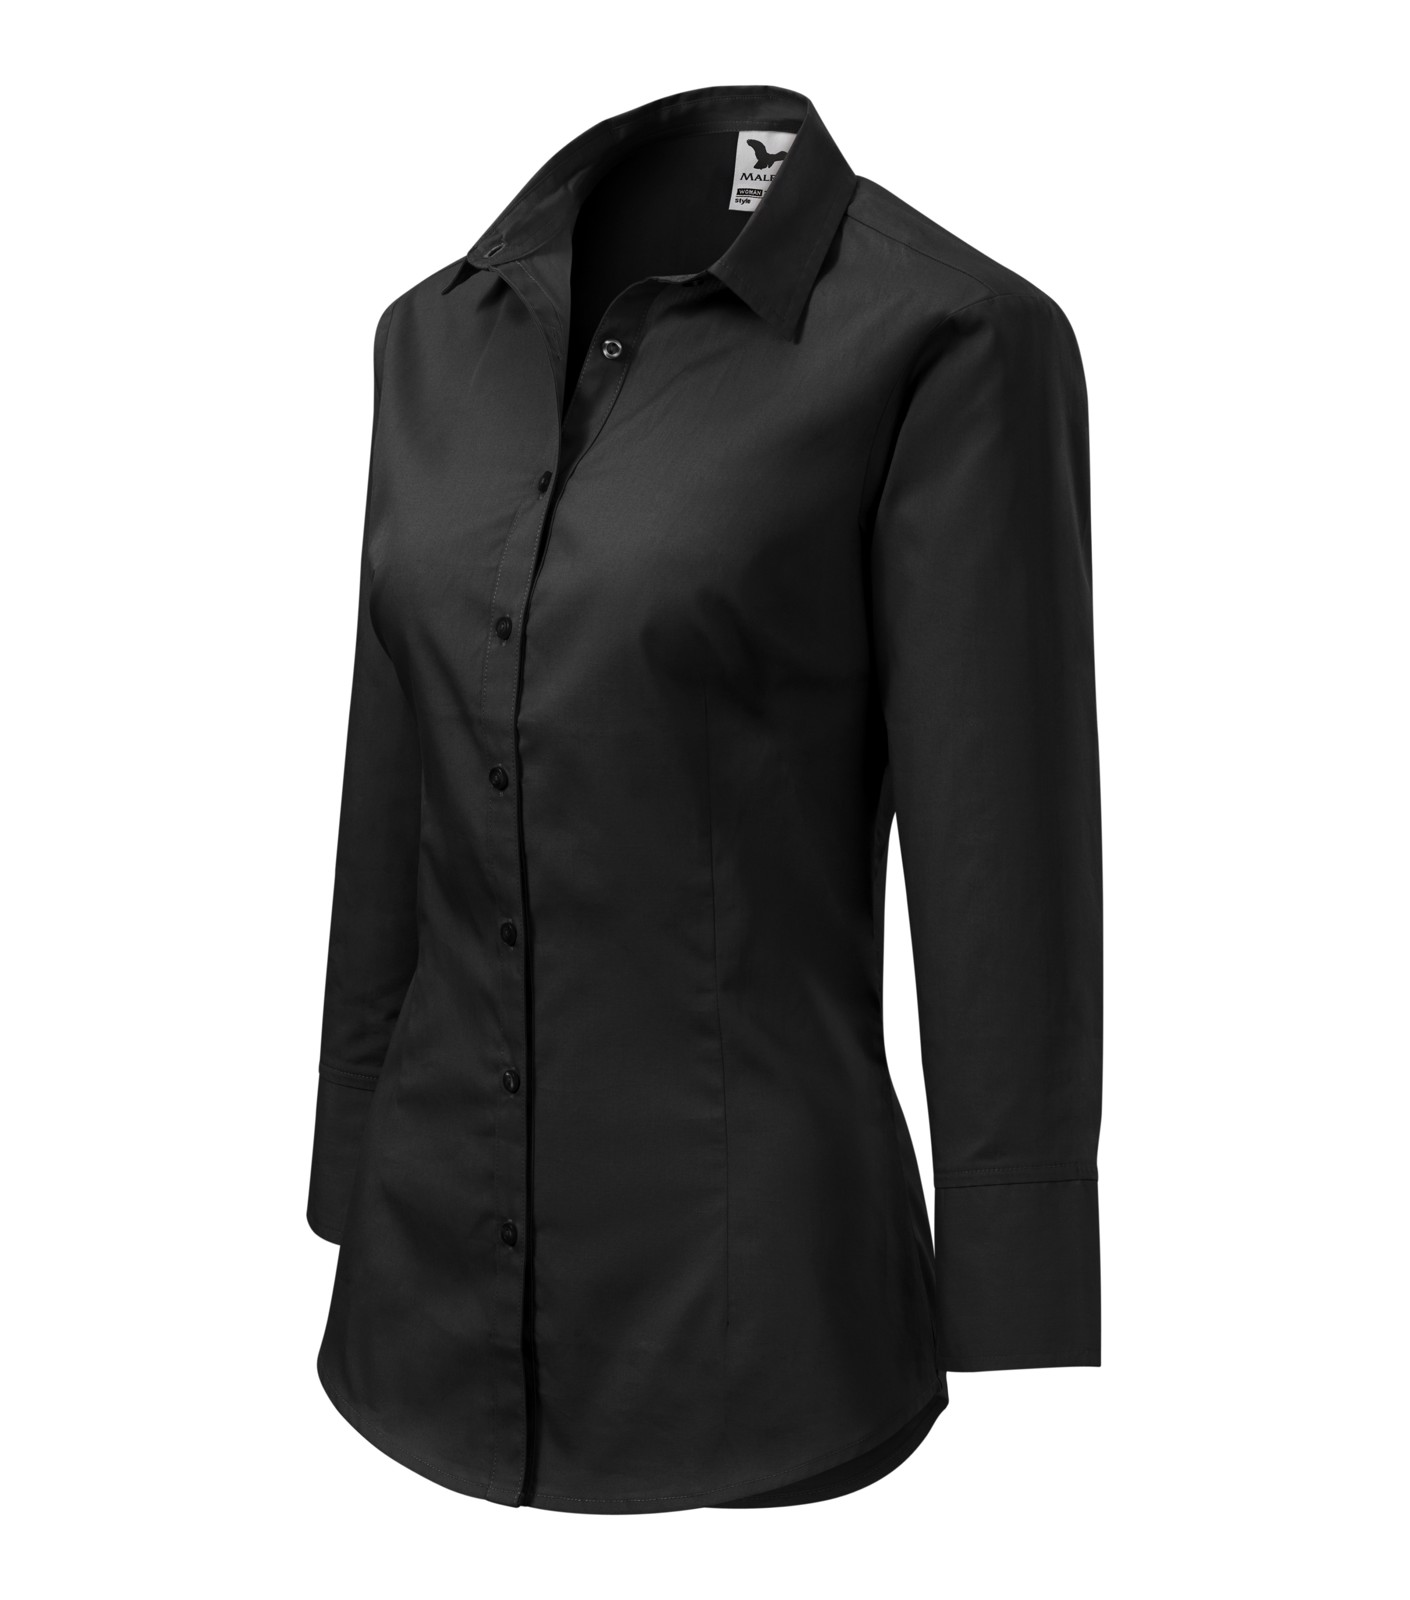 Shirt women's Malfini Style - Black / XL